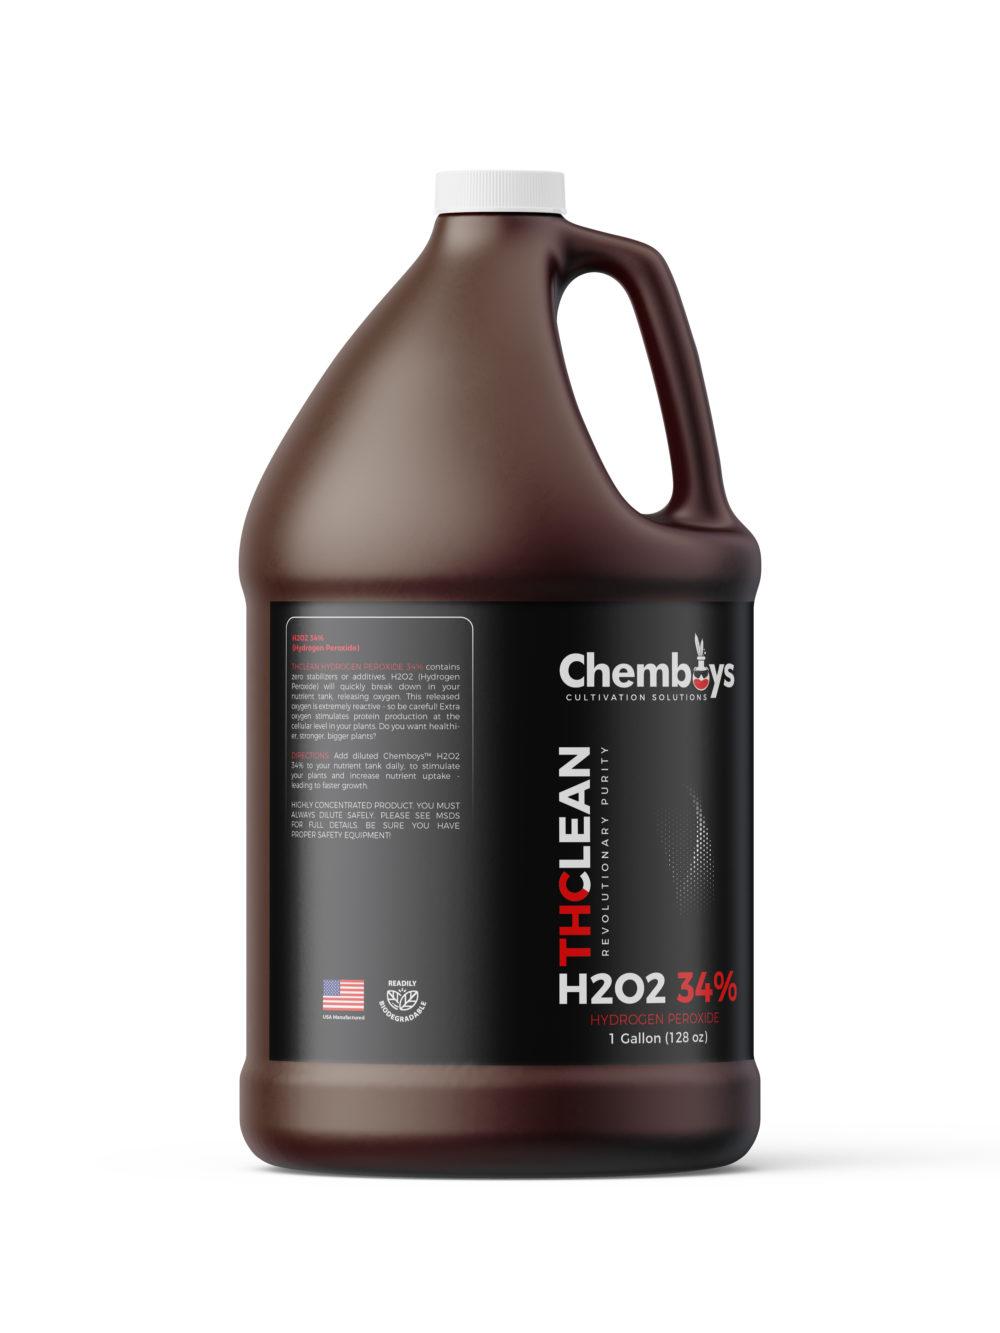 1 Gallon of 34.0% pure H2O2 side view